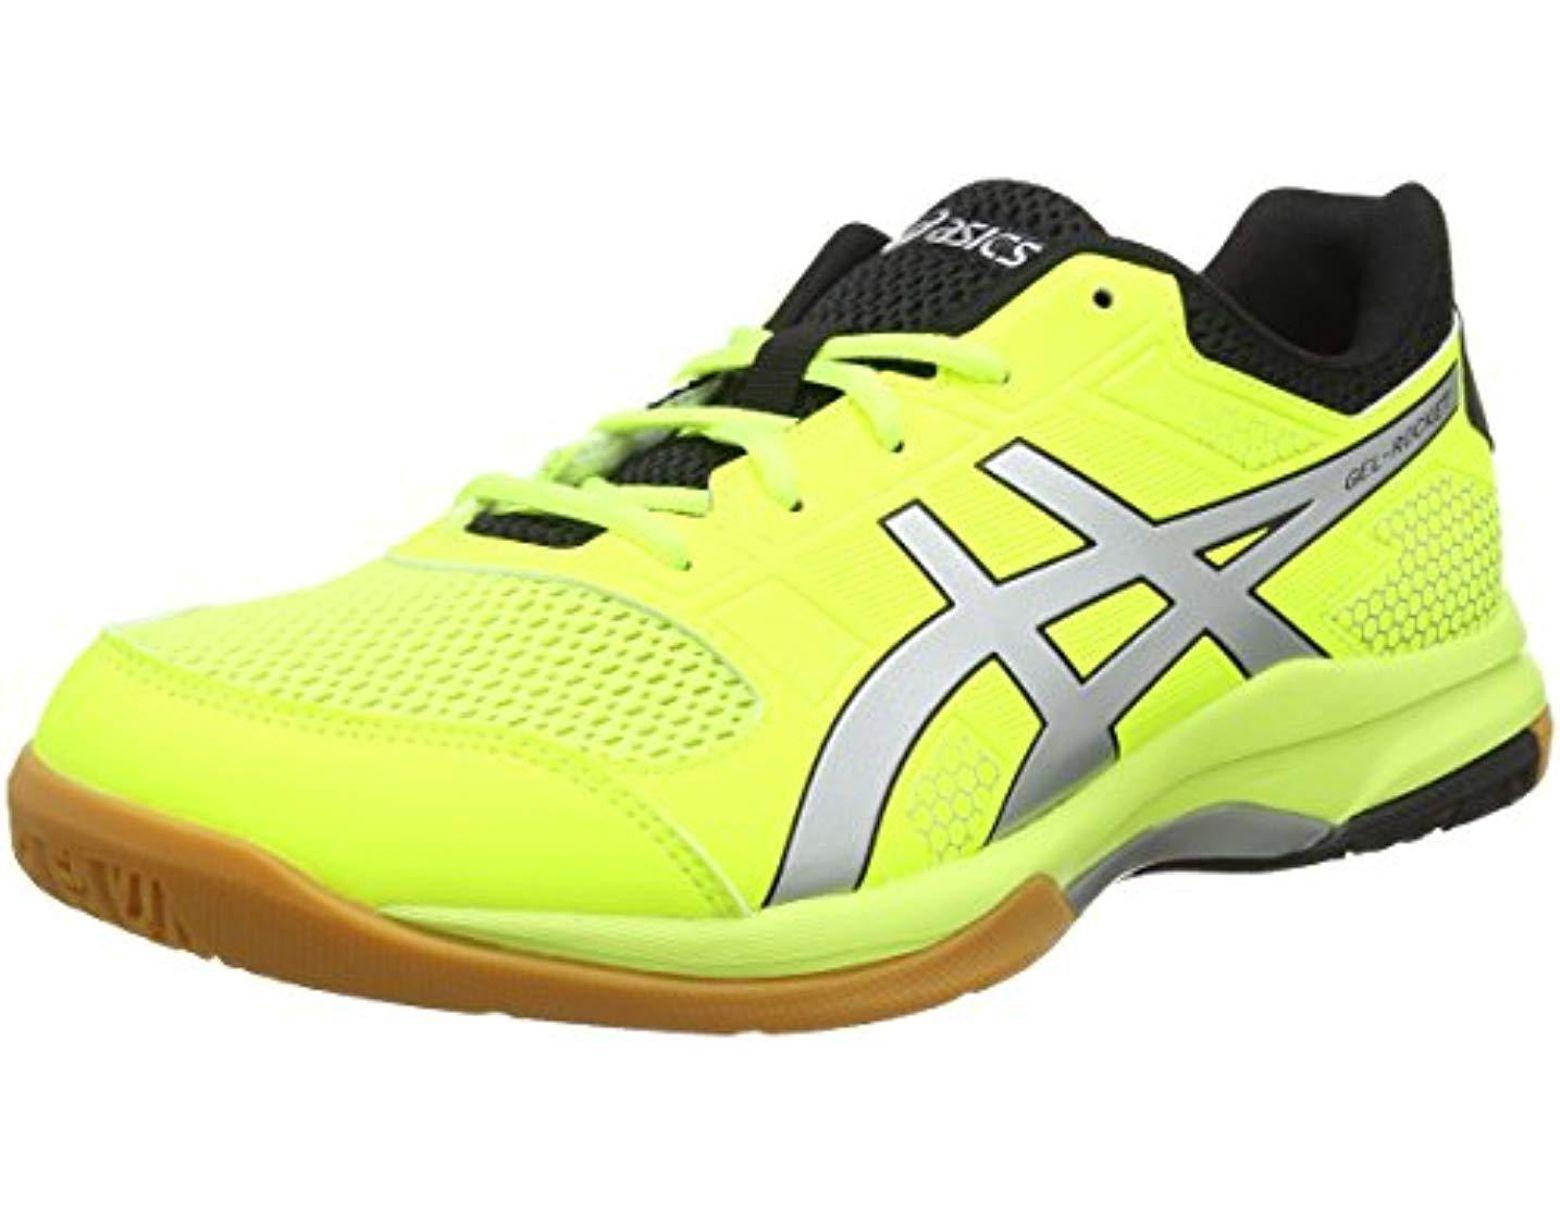 217640d1479be Asics Gel-rocket 8 Multisport Indoor Shoes in Yellow for Men - Save ...